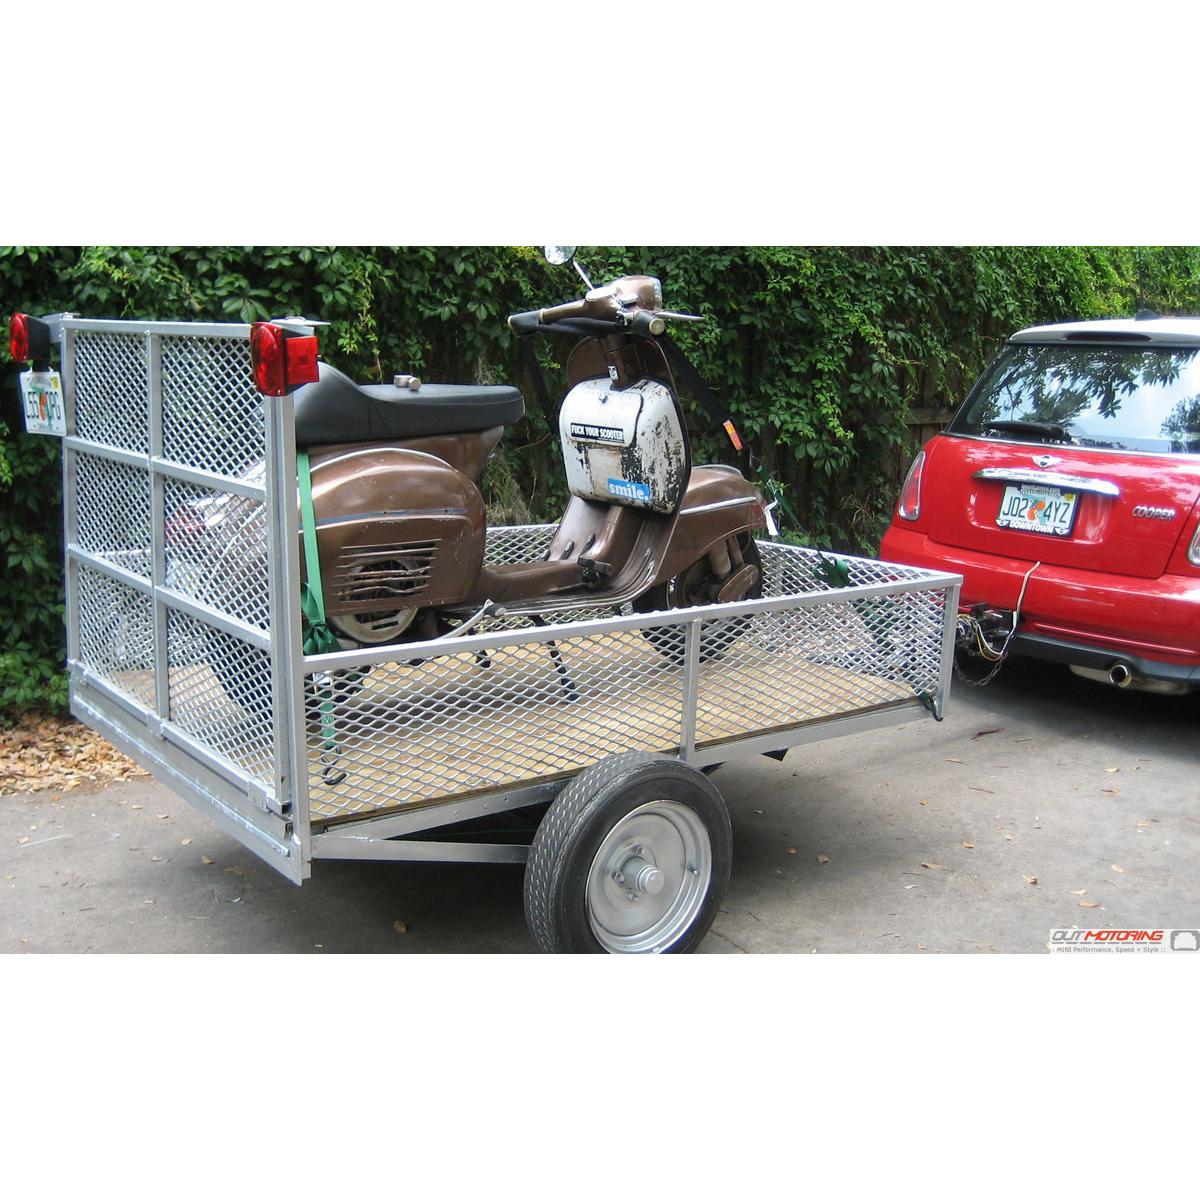 Mdm 1001 Mini R50 Hatchback  R52 Convertible Towing Hitch Bike Rack Mini Cooper Trailer Hidden